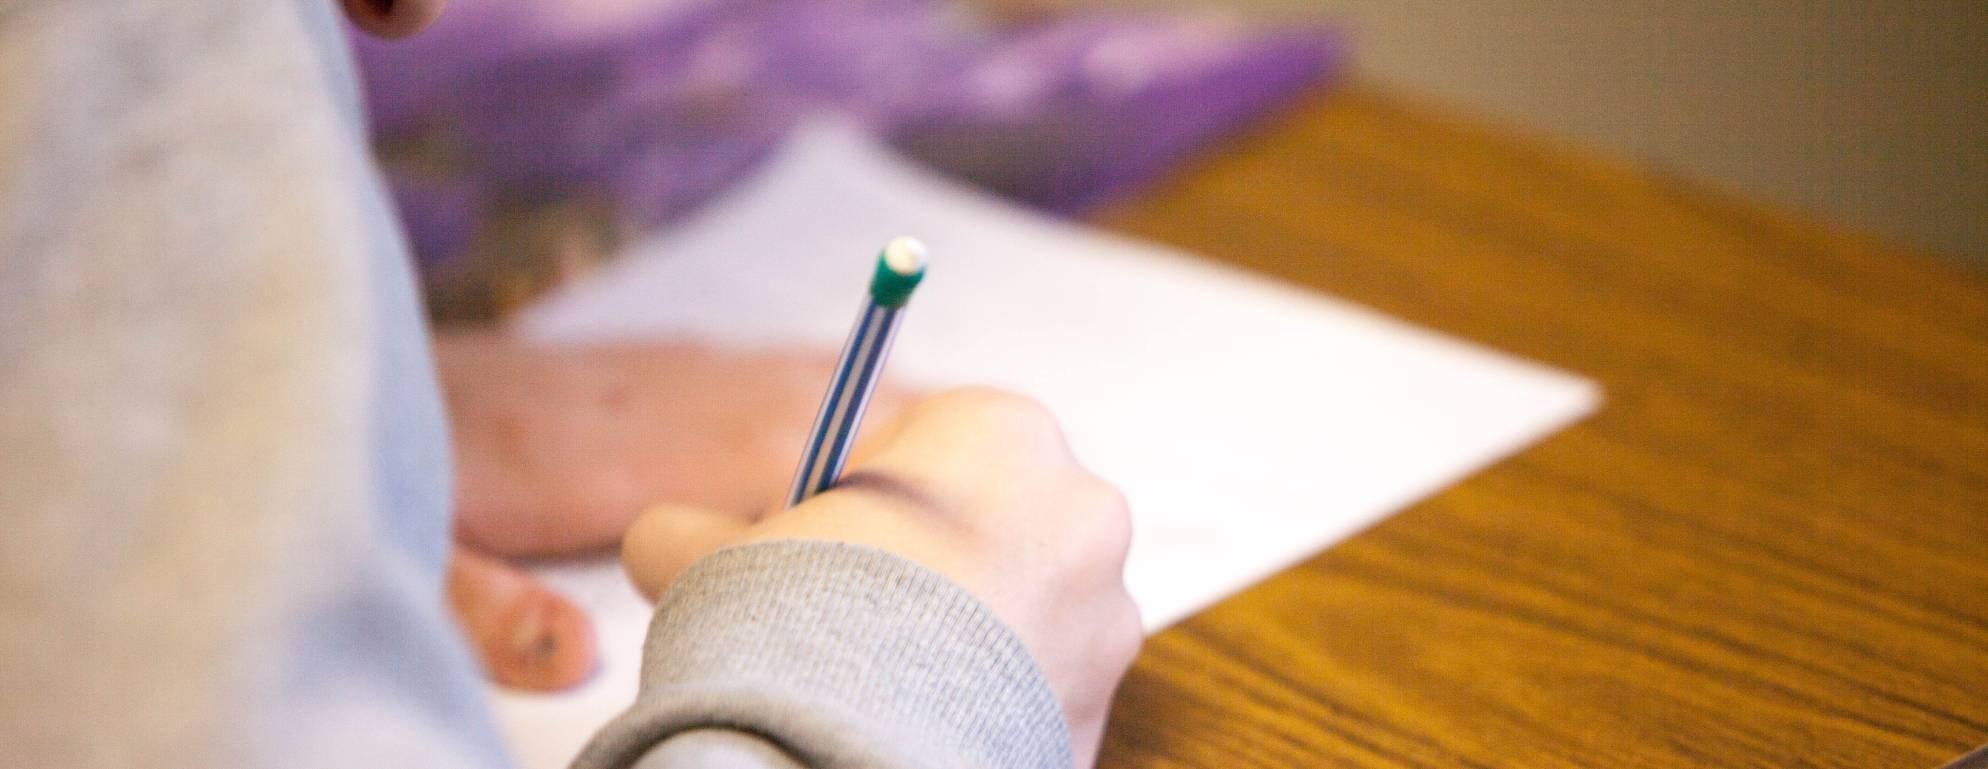 student writing banner - ben-mullins-785450-unsplash